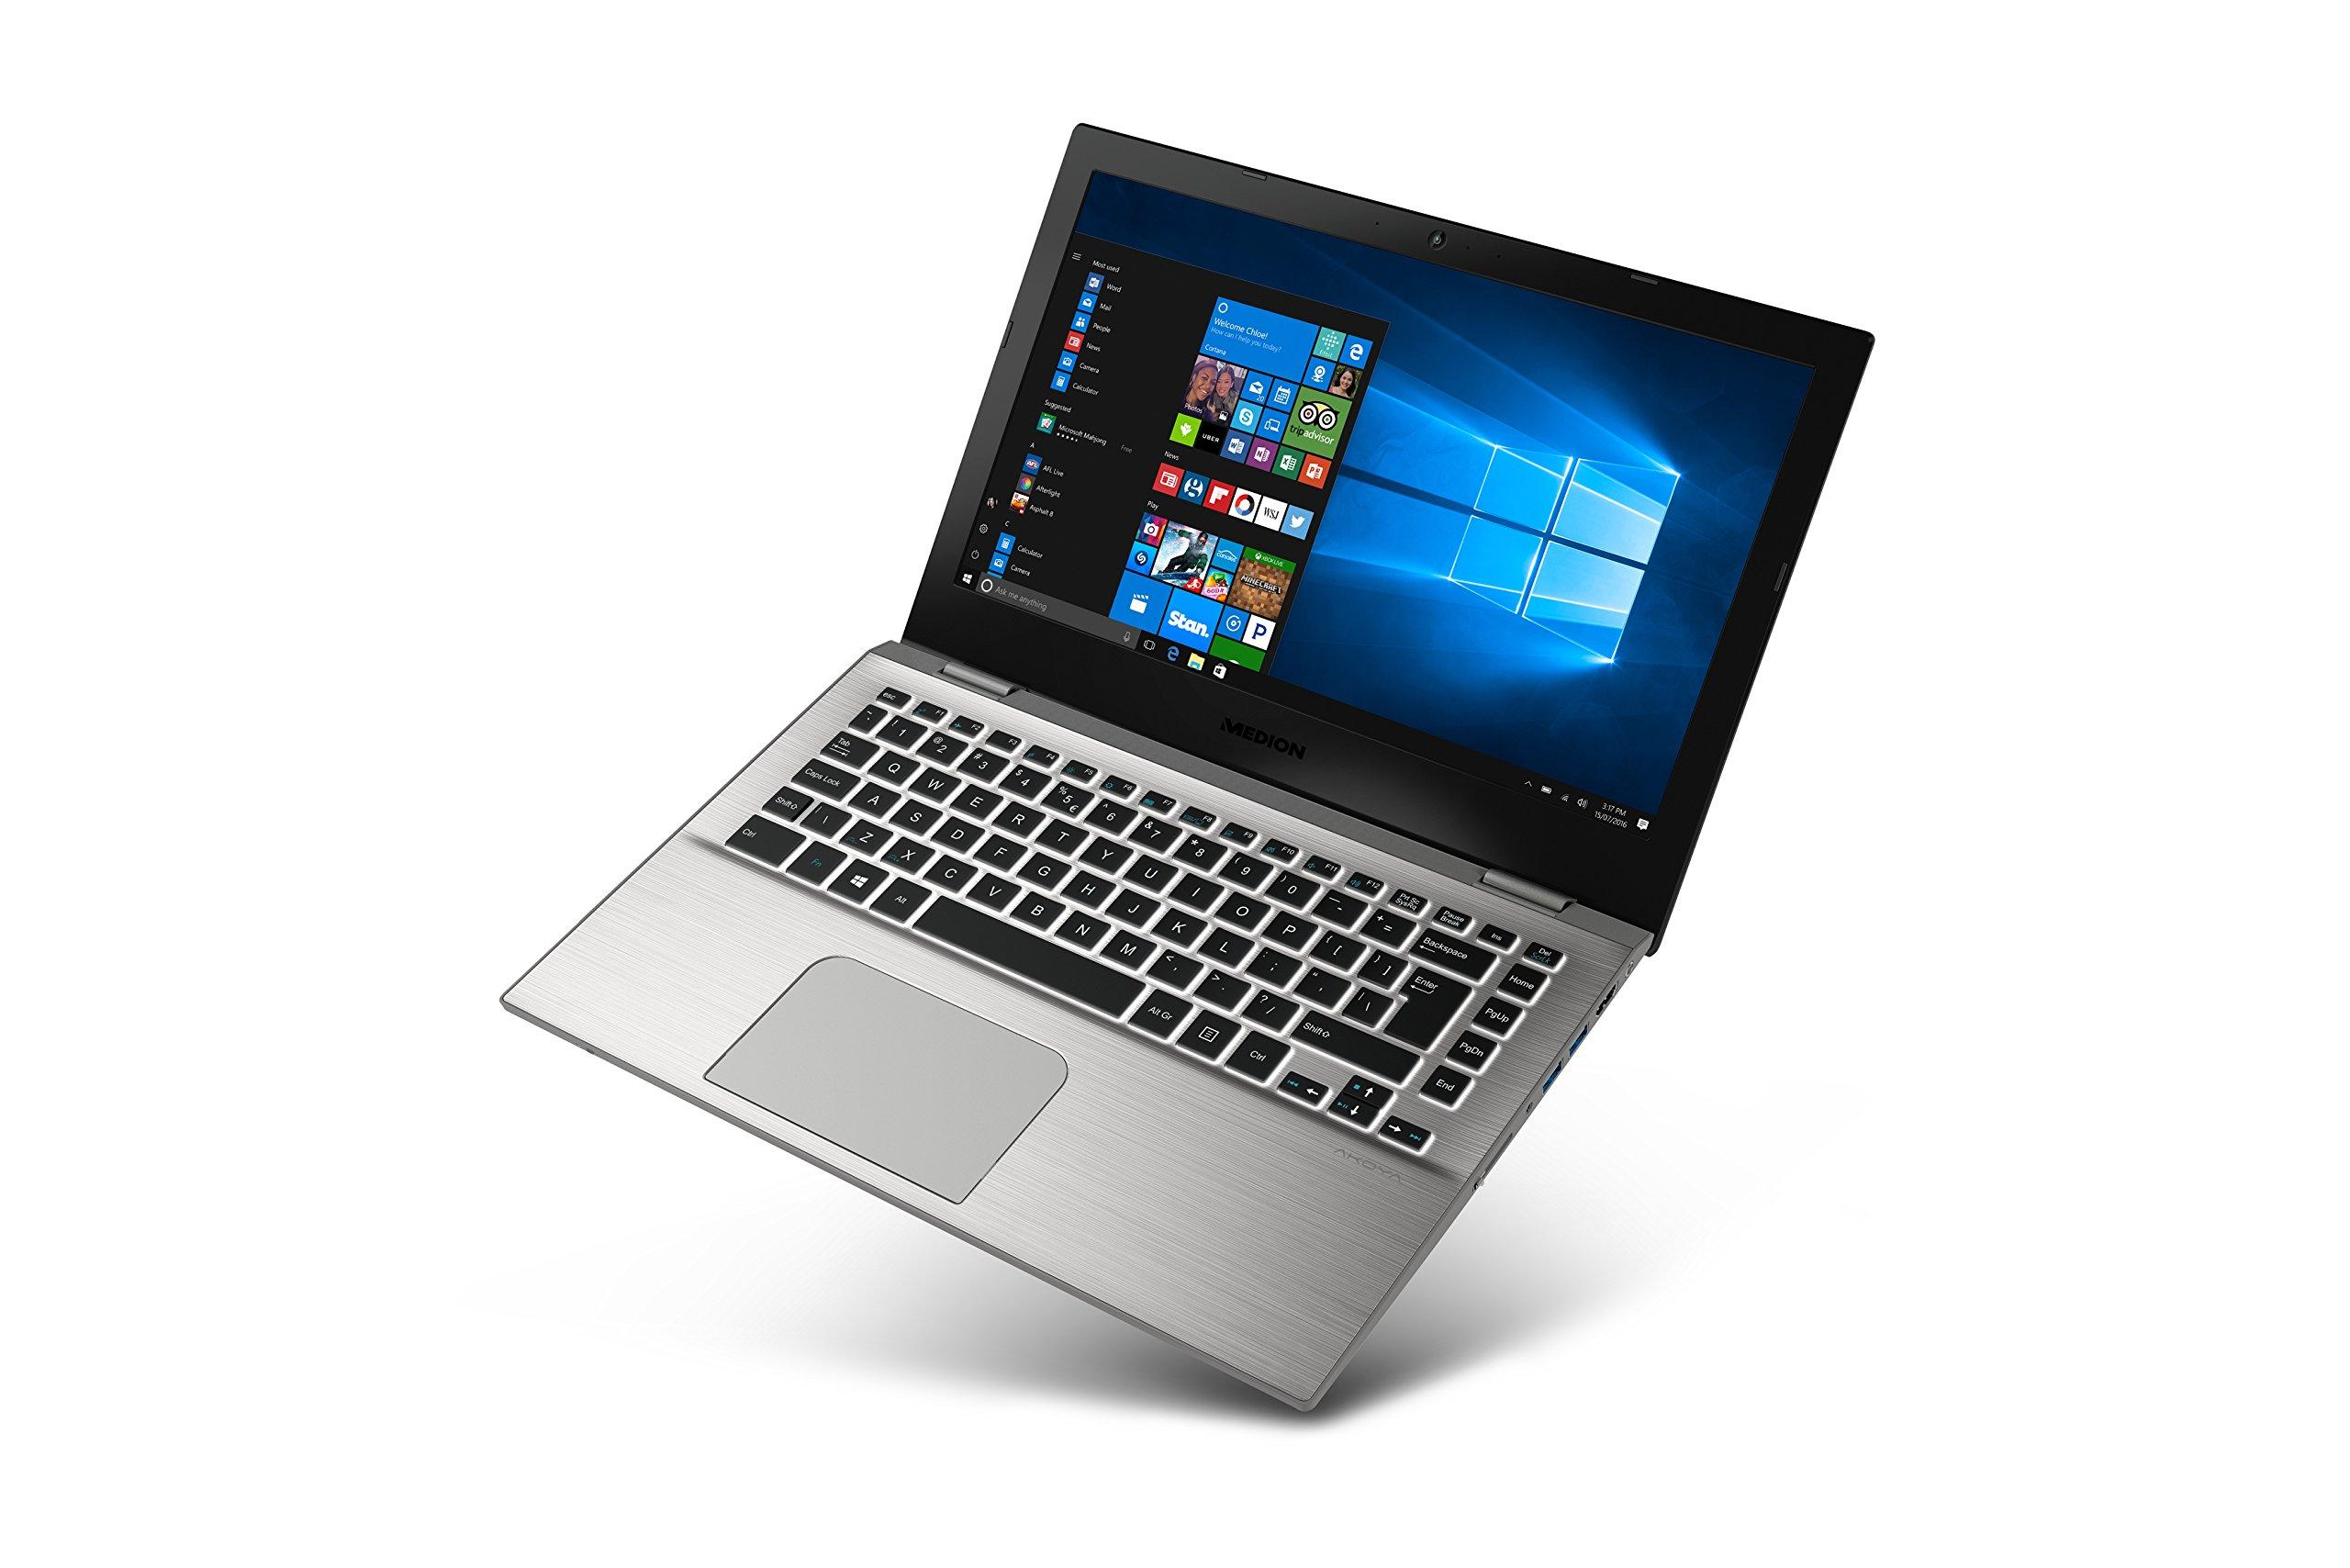 Medion AKOYA S3409 13.3インチラップトップ - バリアント30021747パワーIntel Core i3、4GB RAM、256GB SSD